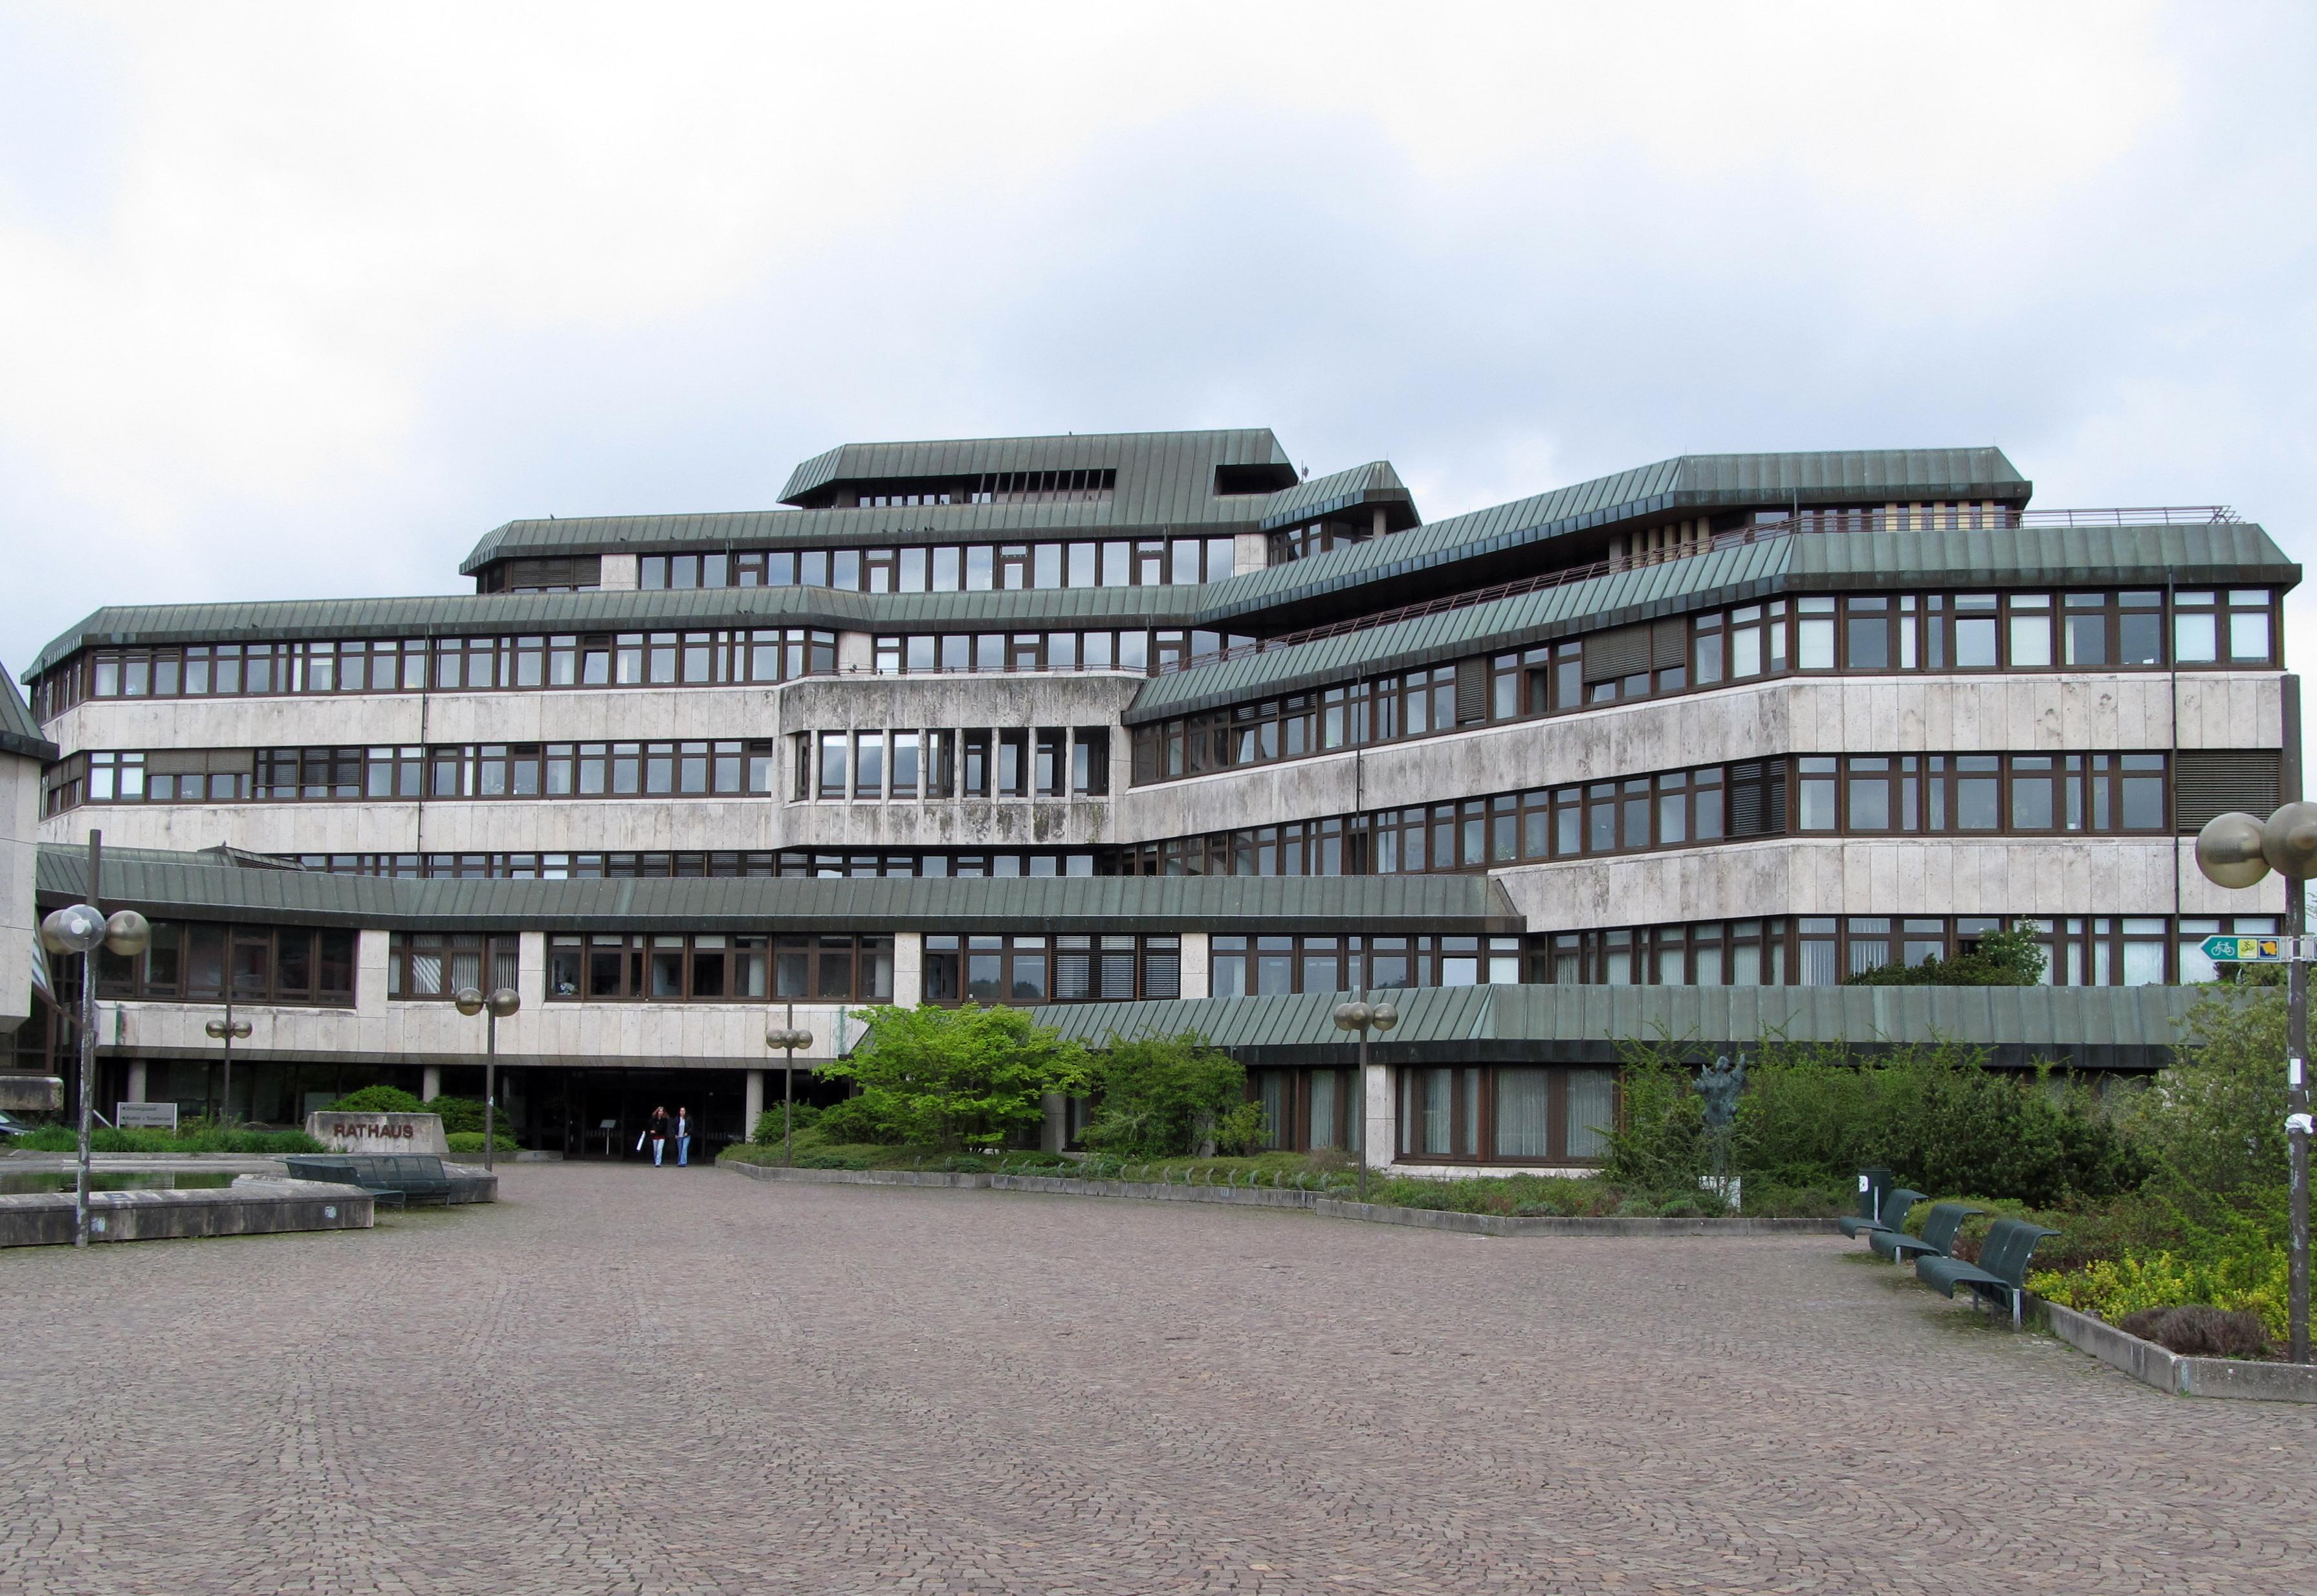 Blowjob online Homburg (Saar)(Saarland)